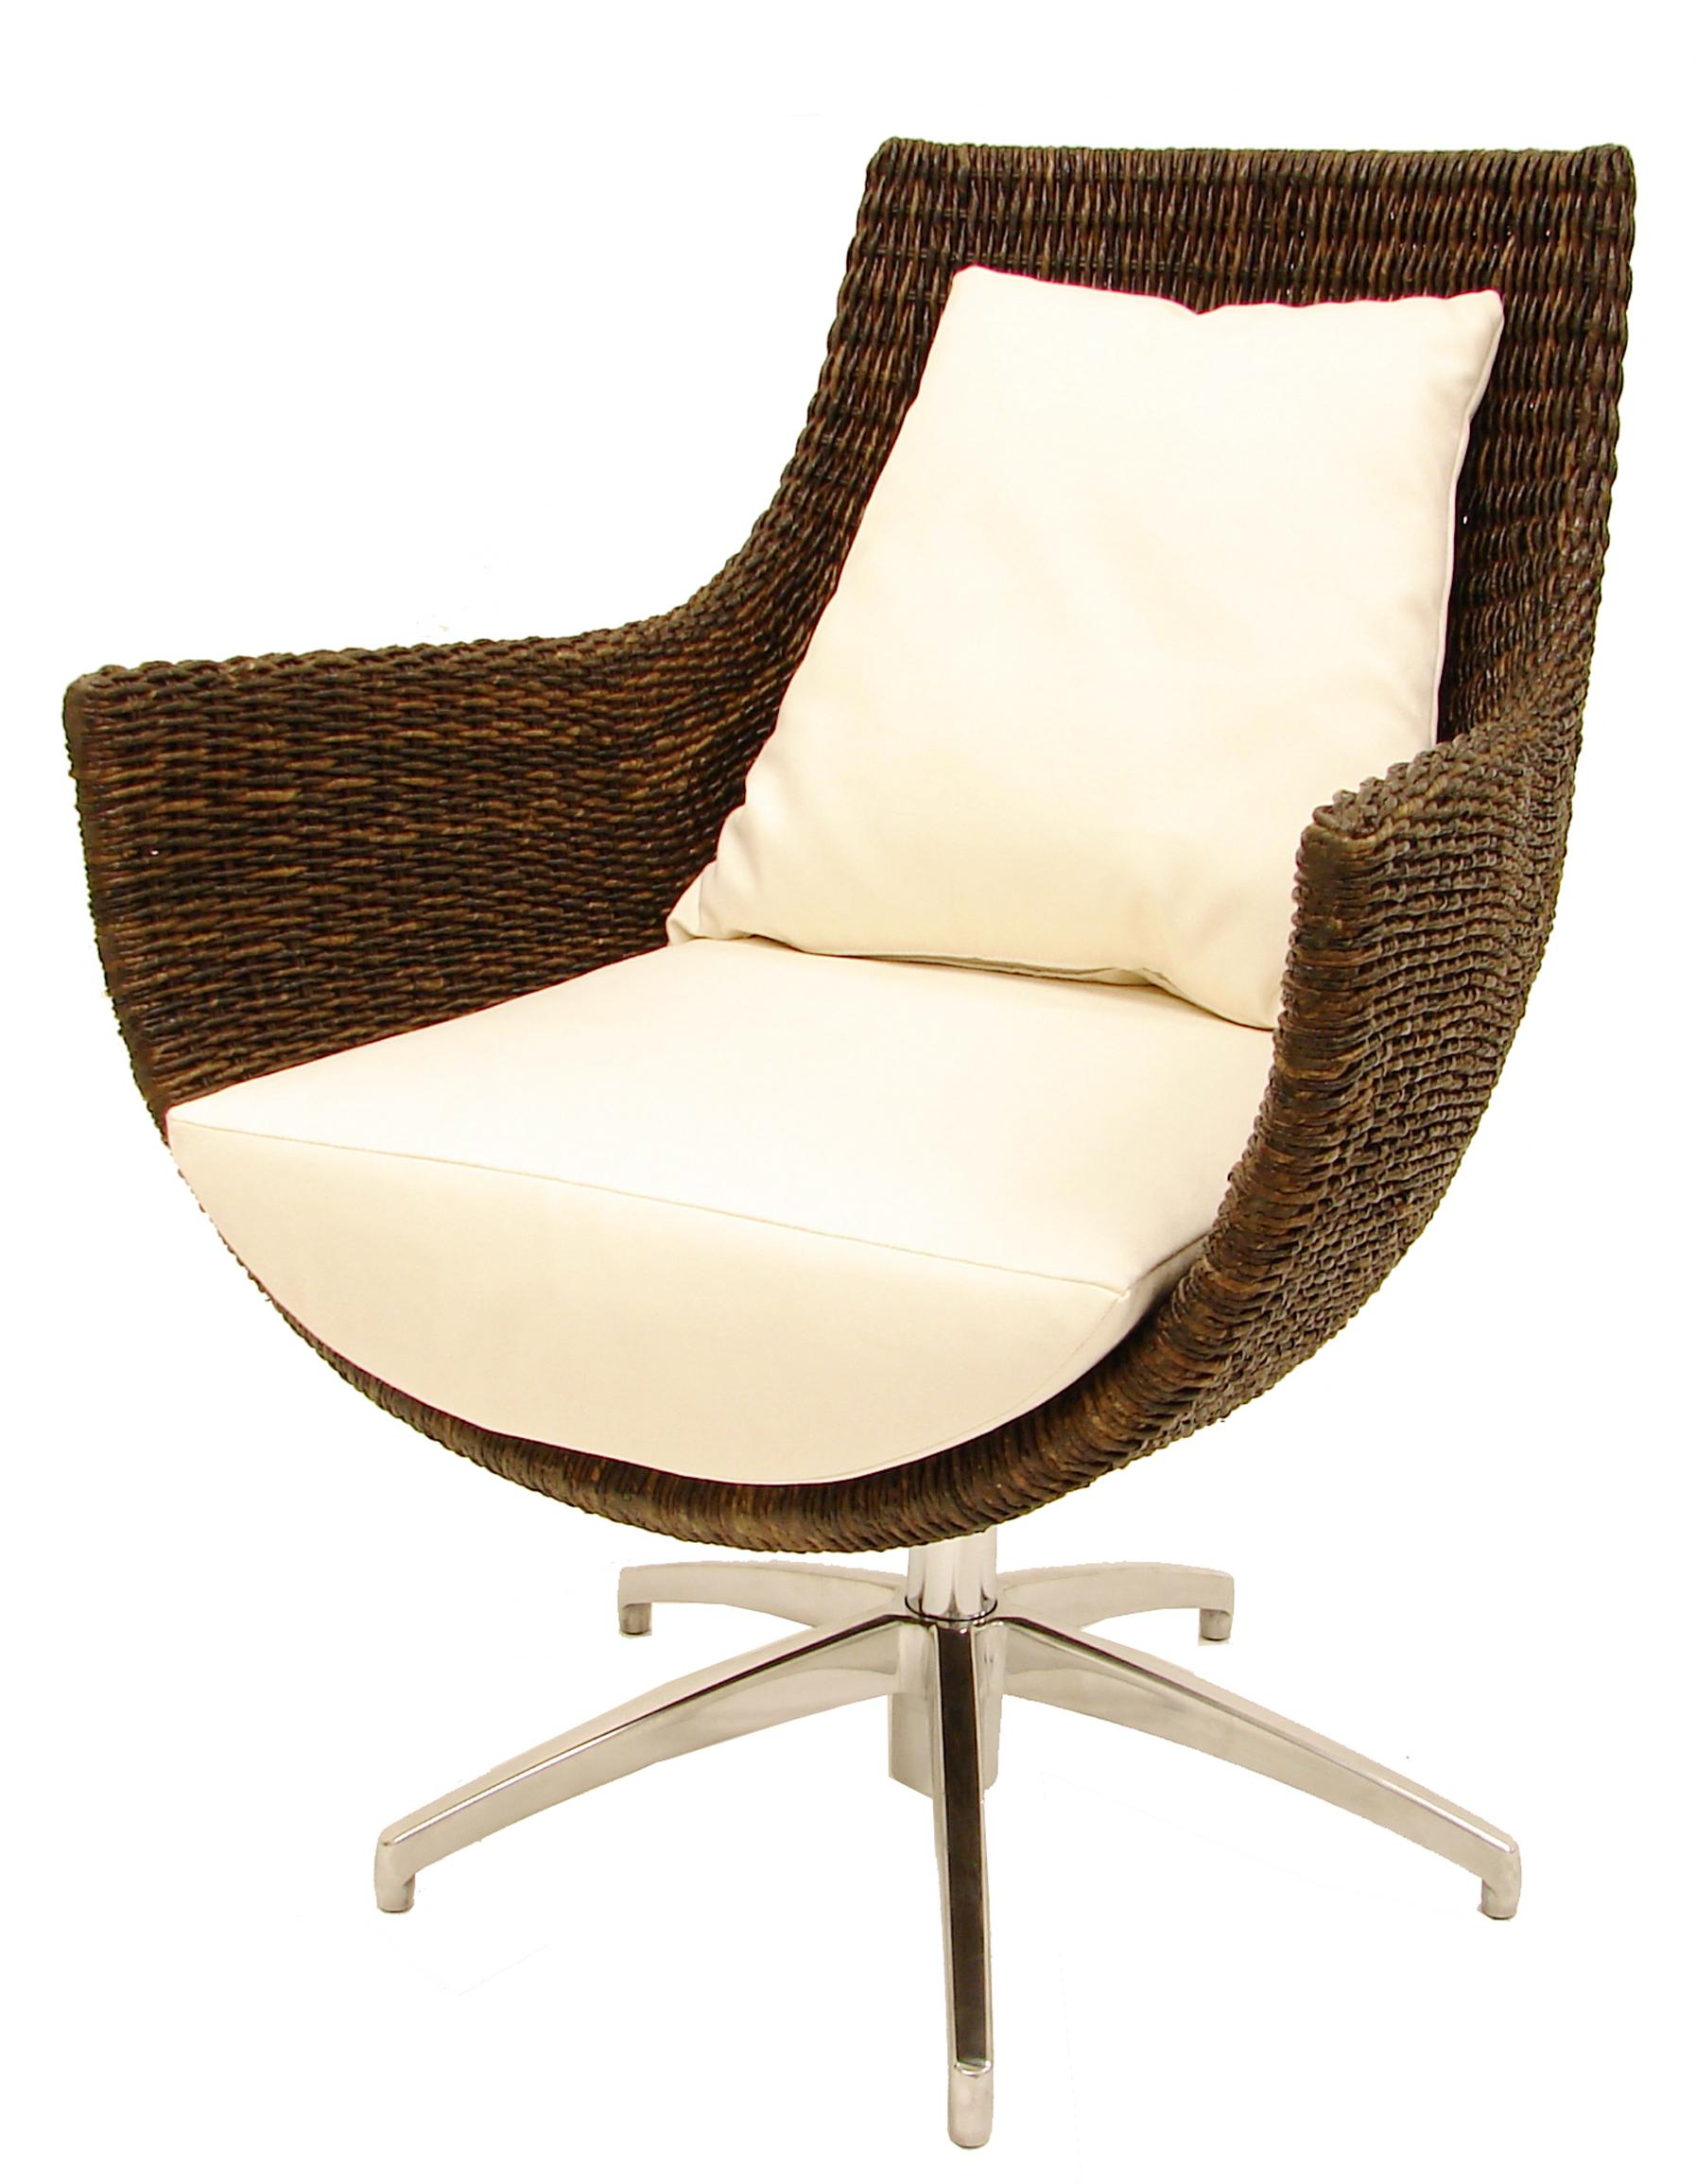 Palecek accent chairs by palecek modern high back rattan High back swivel chair for living room